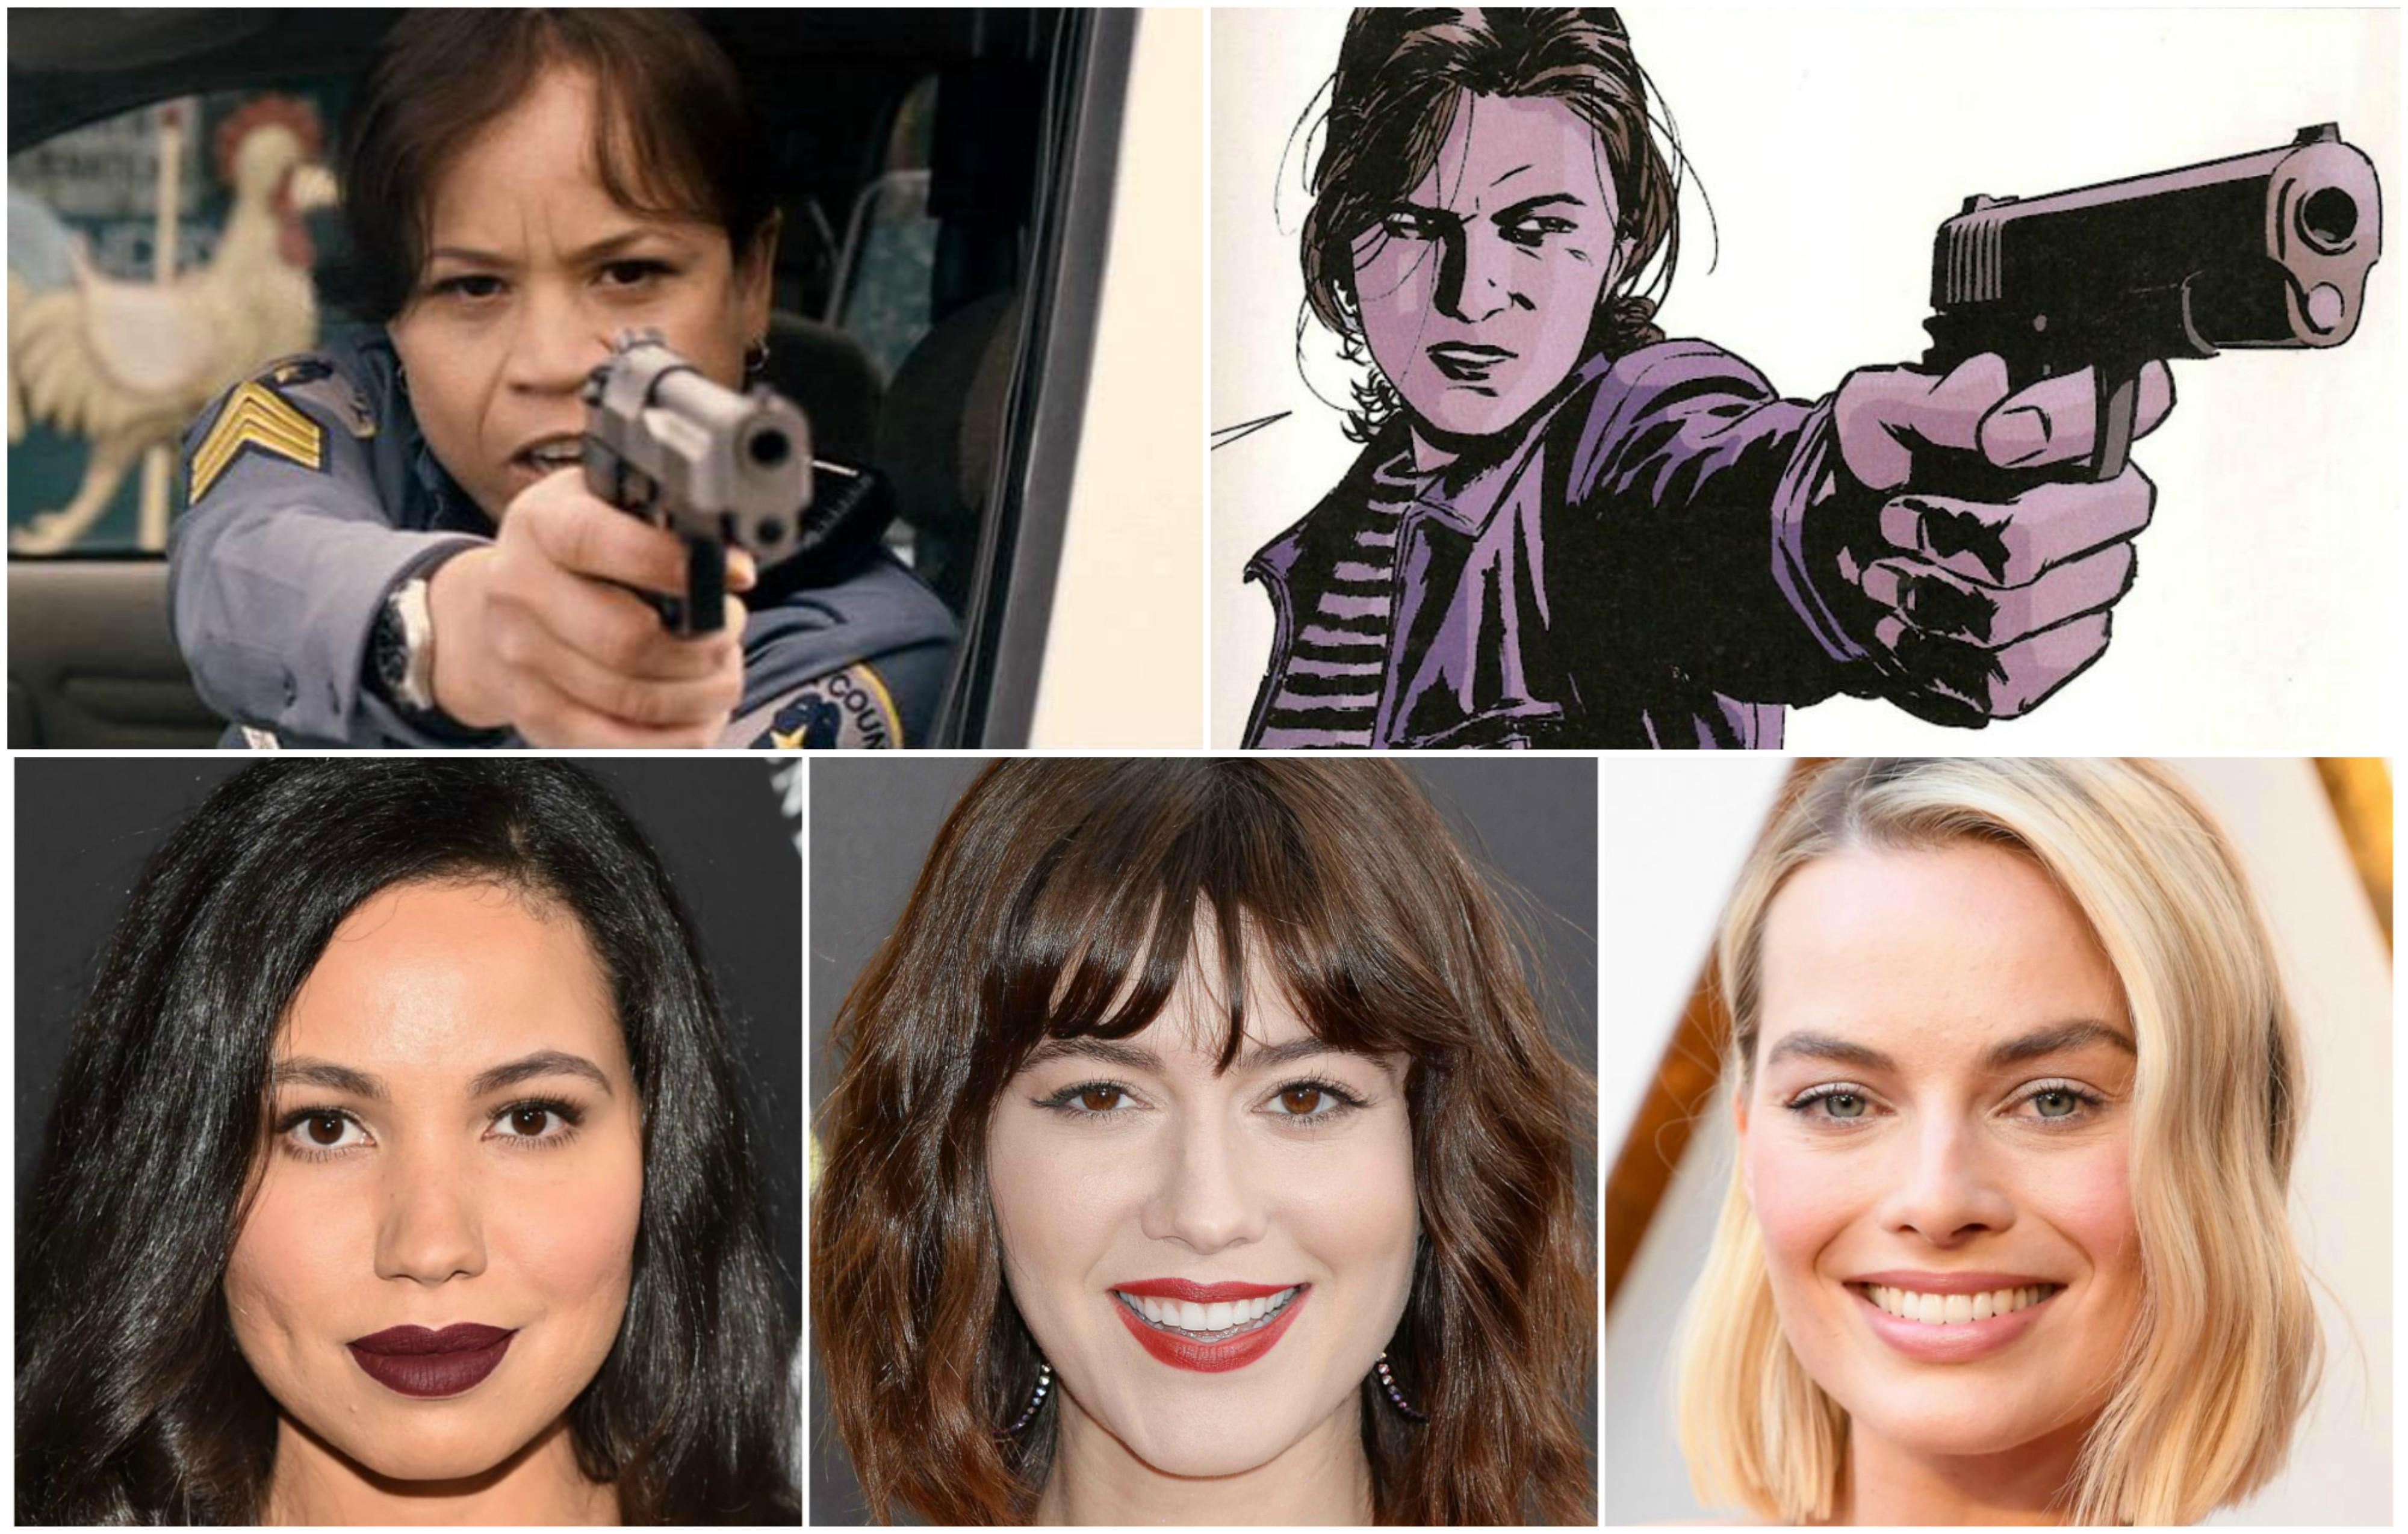 Rosie Perez Cast As Detective Renee Montoya In Birds Of Prey Blackfilm Com Black Movies Television And Theatre News